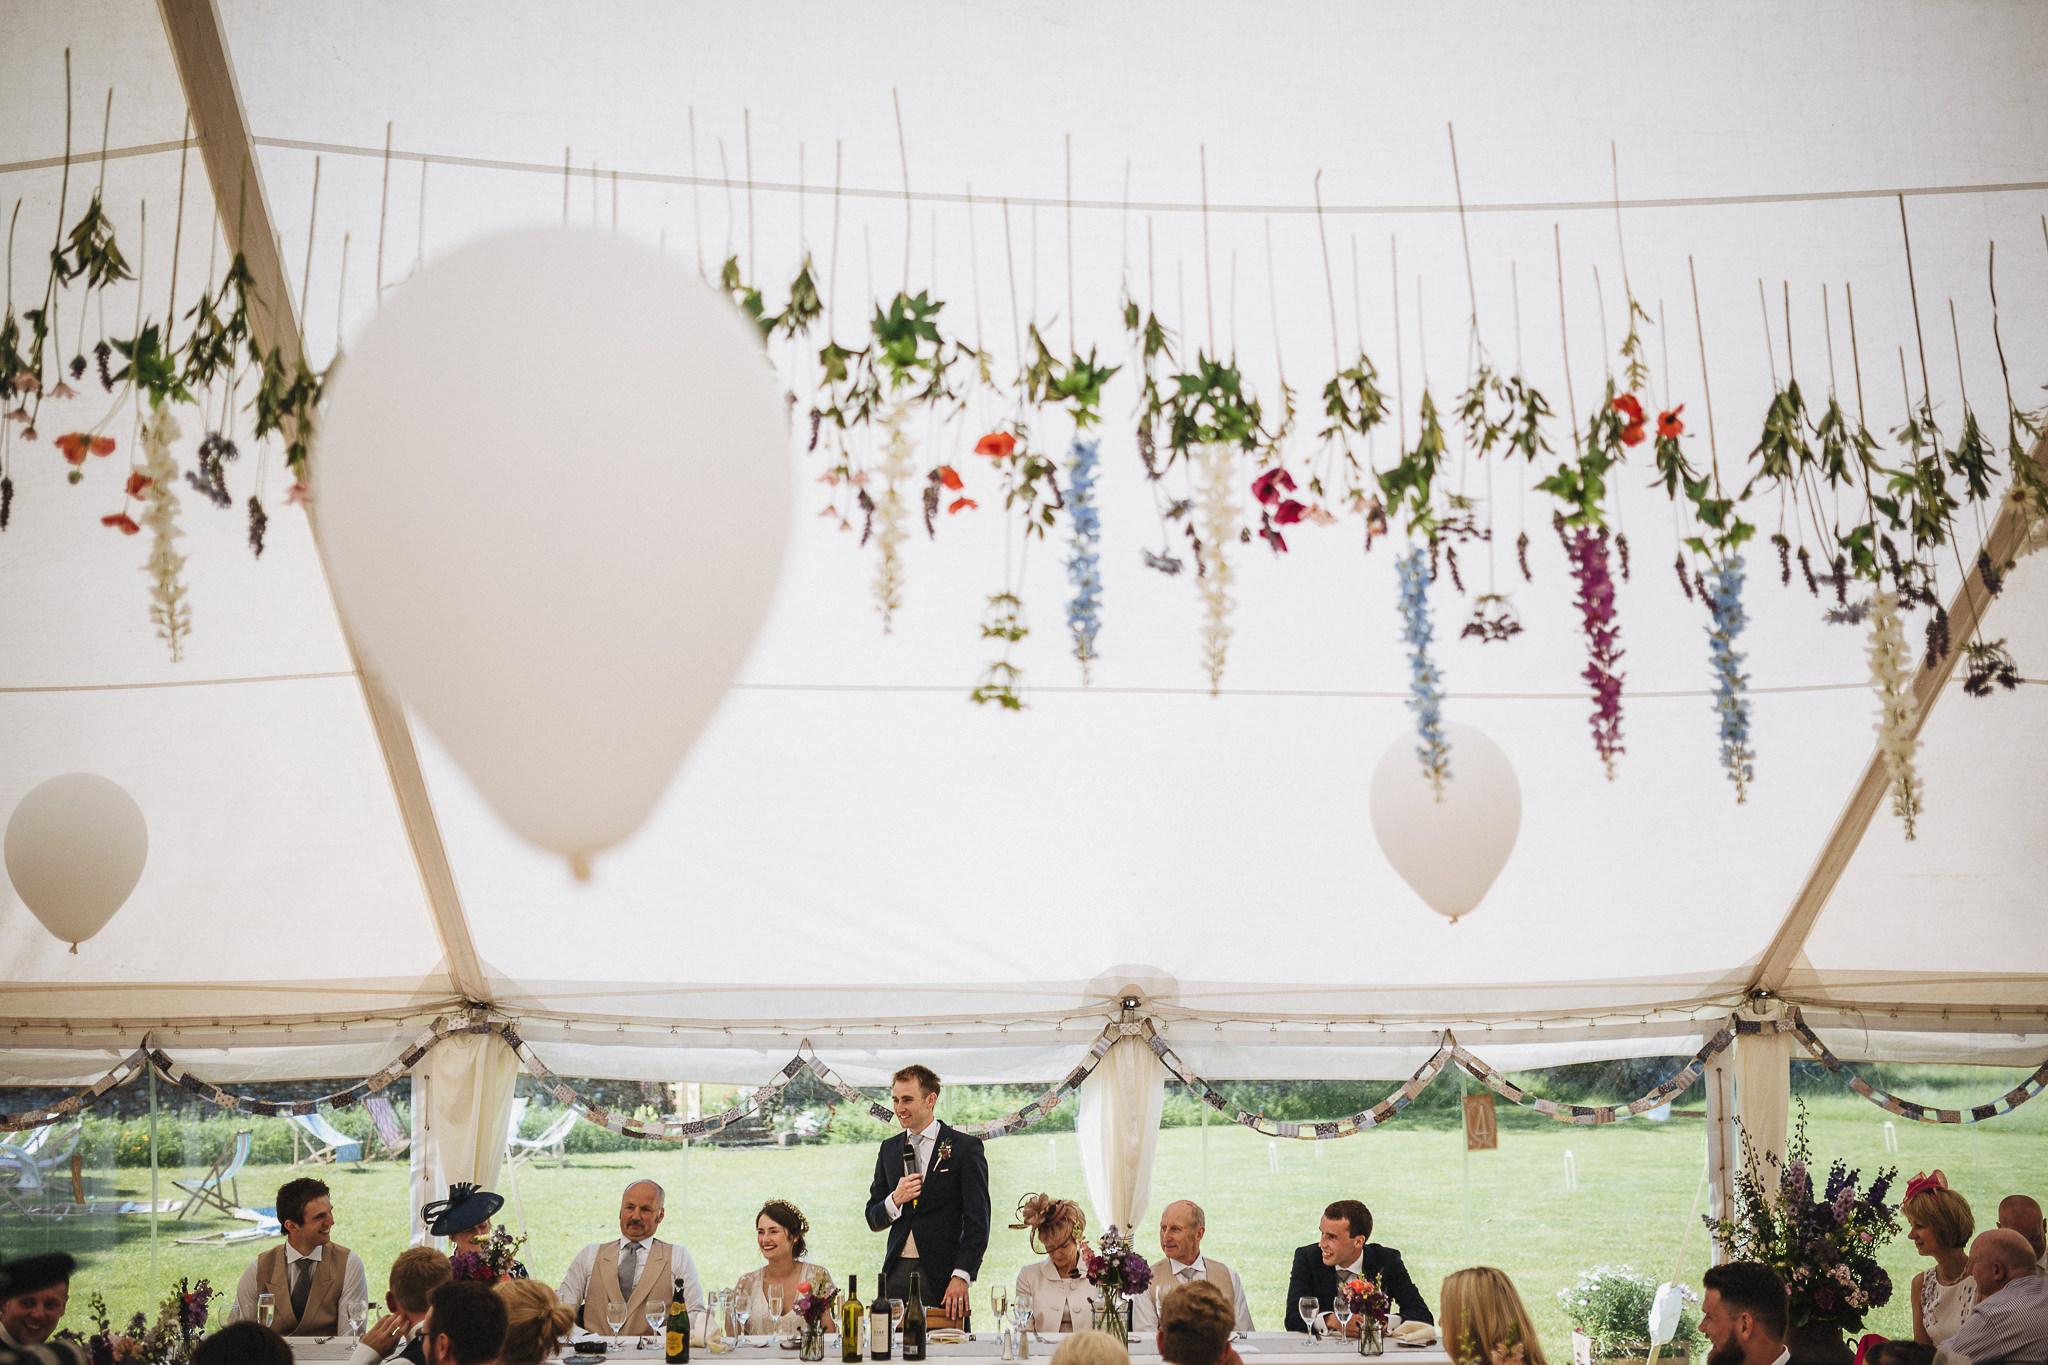 paul-marbrook-Farm-Wedding-Photographer-Lancashire-90057